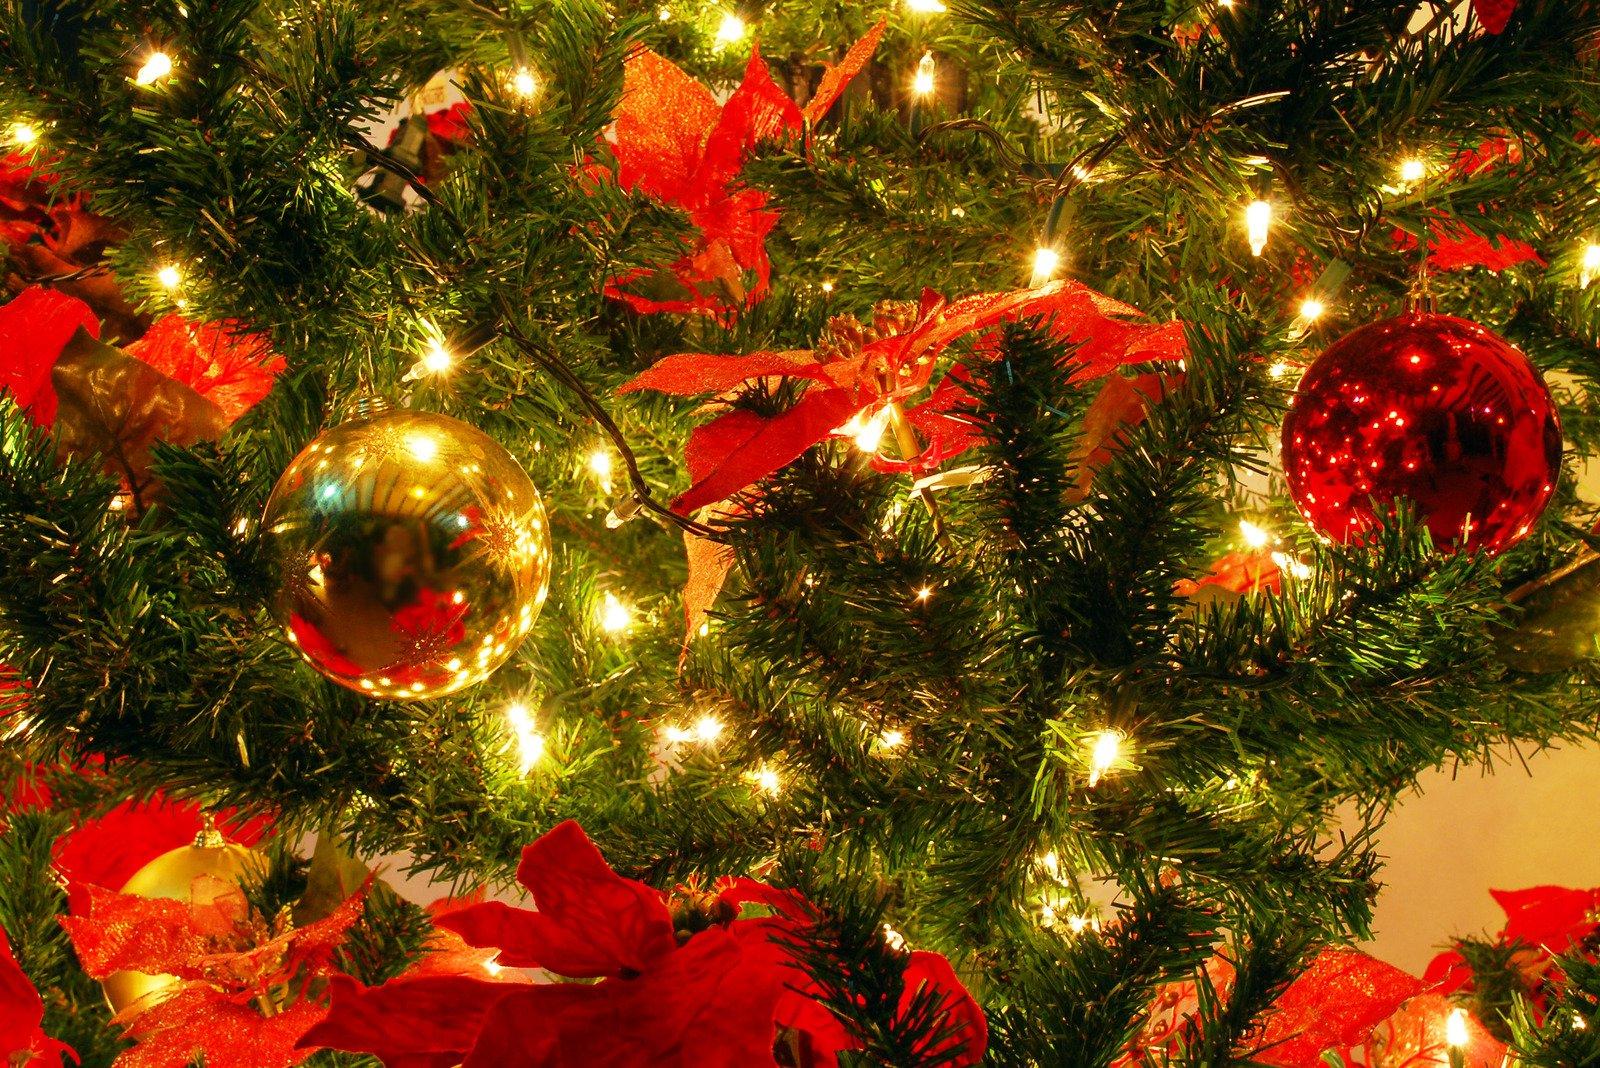 Immagini Natalizie Gratuite.Foto Stock D Archivio Serie Di Natale Gratuite Freeimages Com